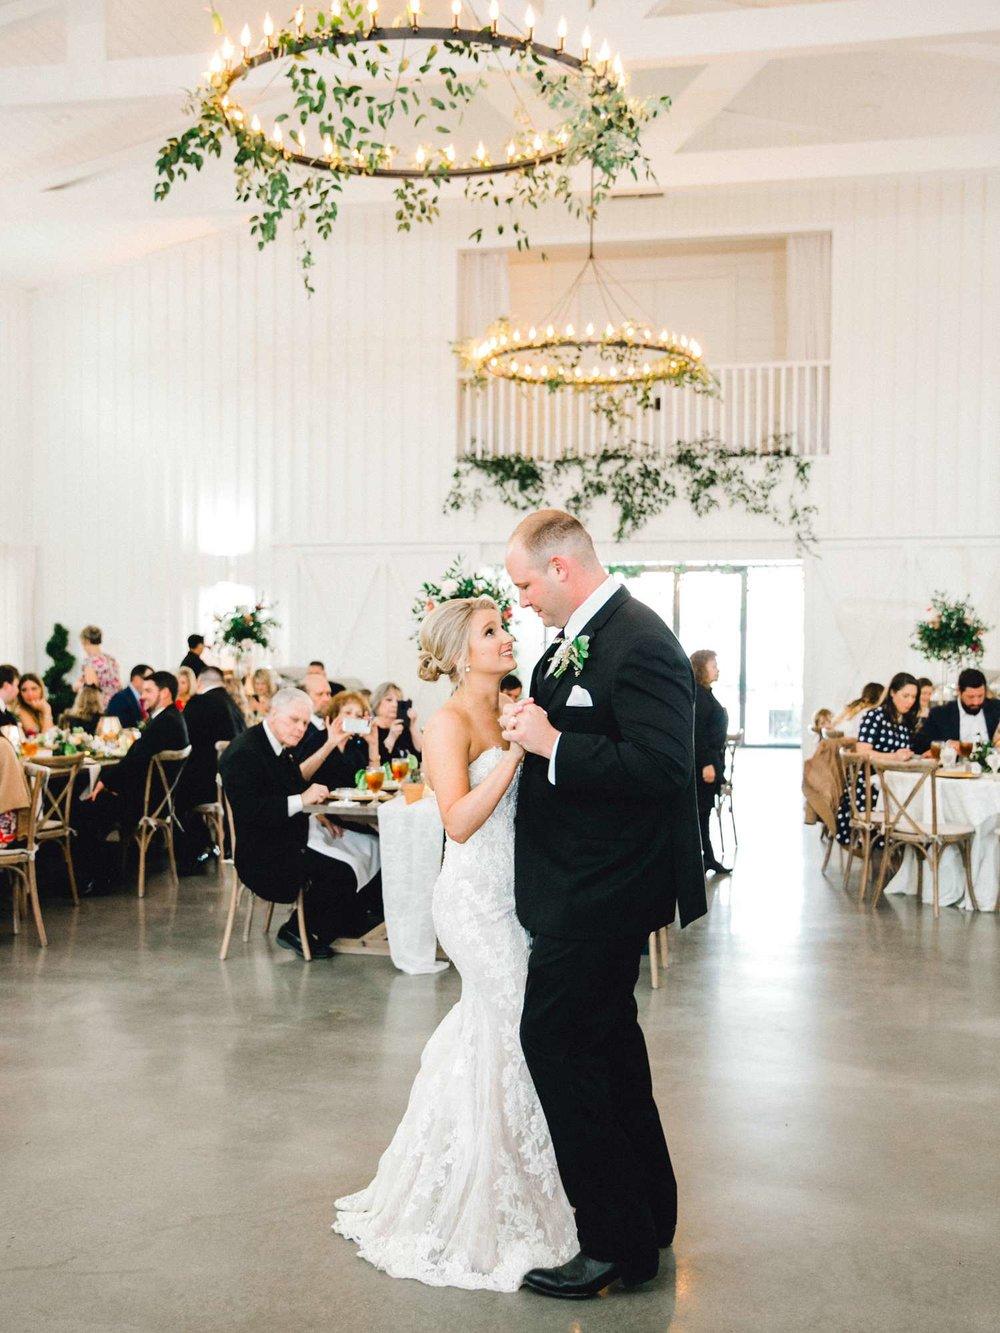 HEBERT_MORGAN_AND_CLAY_ALLEEJ_THE_FARMHOUSE_MONTGOMERY_TEXAS_WEDDING_0165.jpg